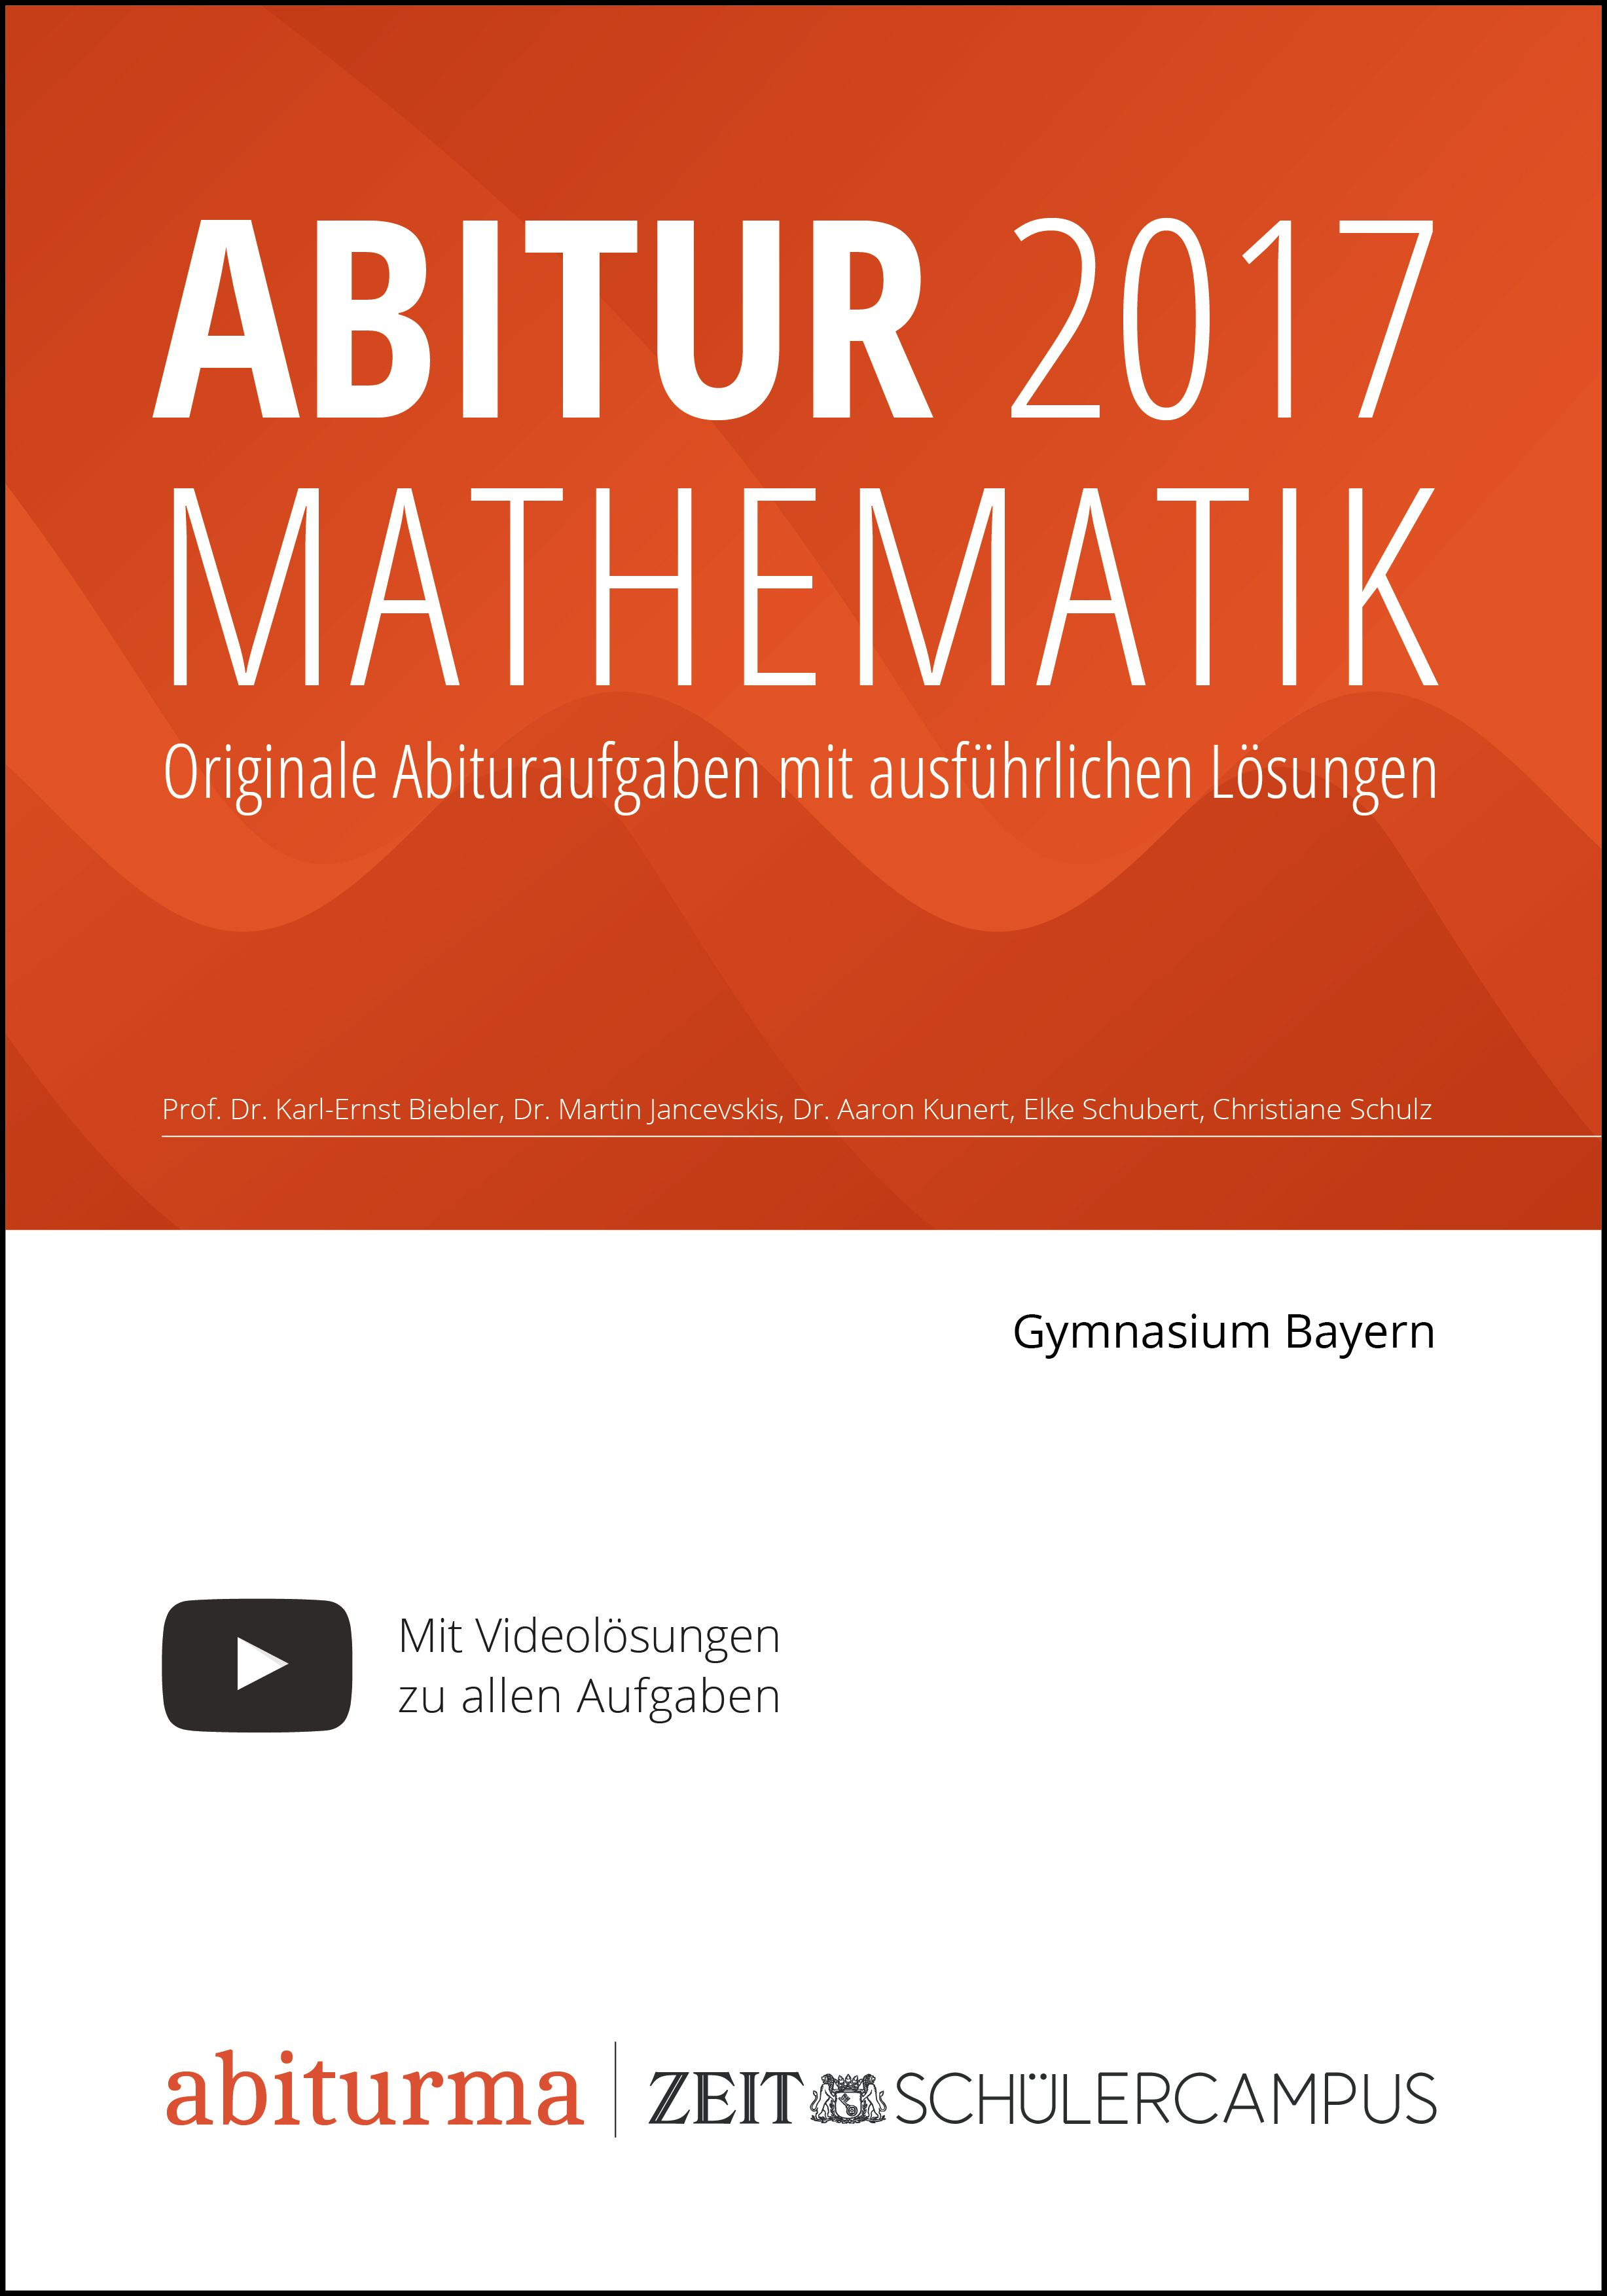 abitur 2017 mathematik bayern von biebler prof dr karl ernst jance. Black Bedroom Furniture Sets. Home Design Ideas